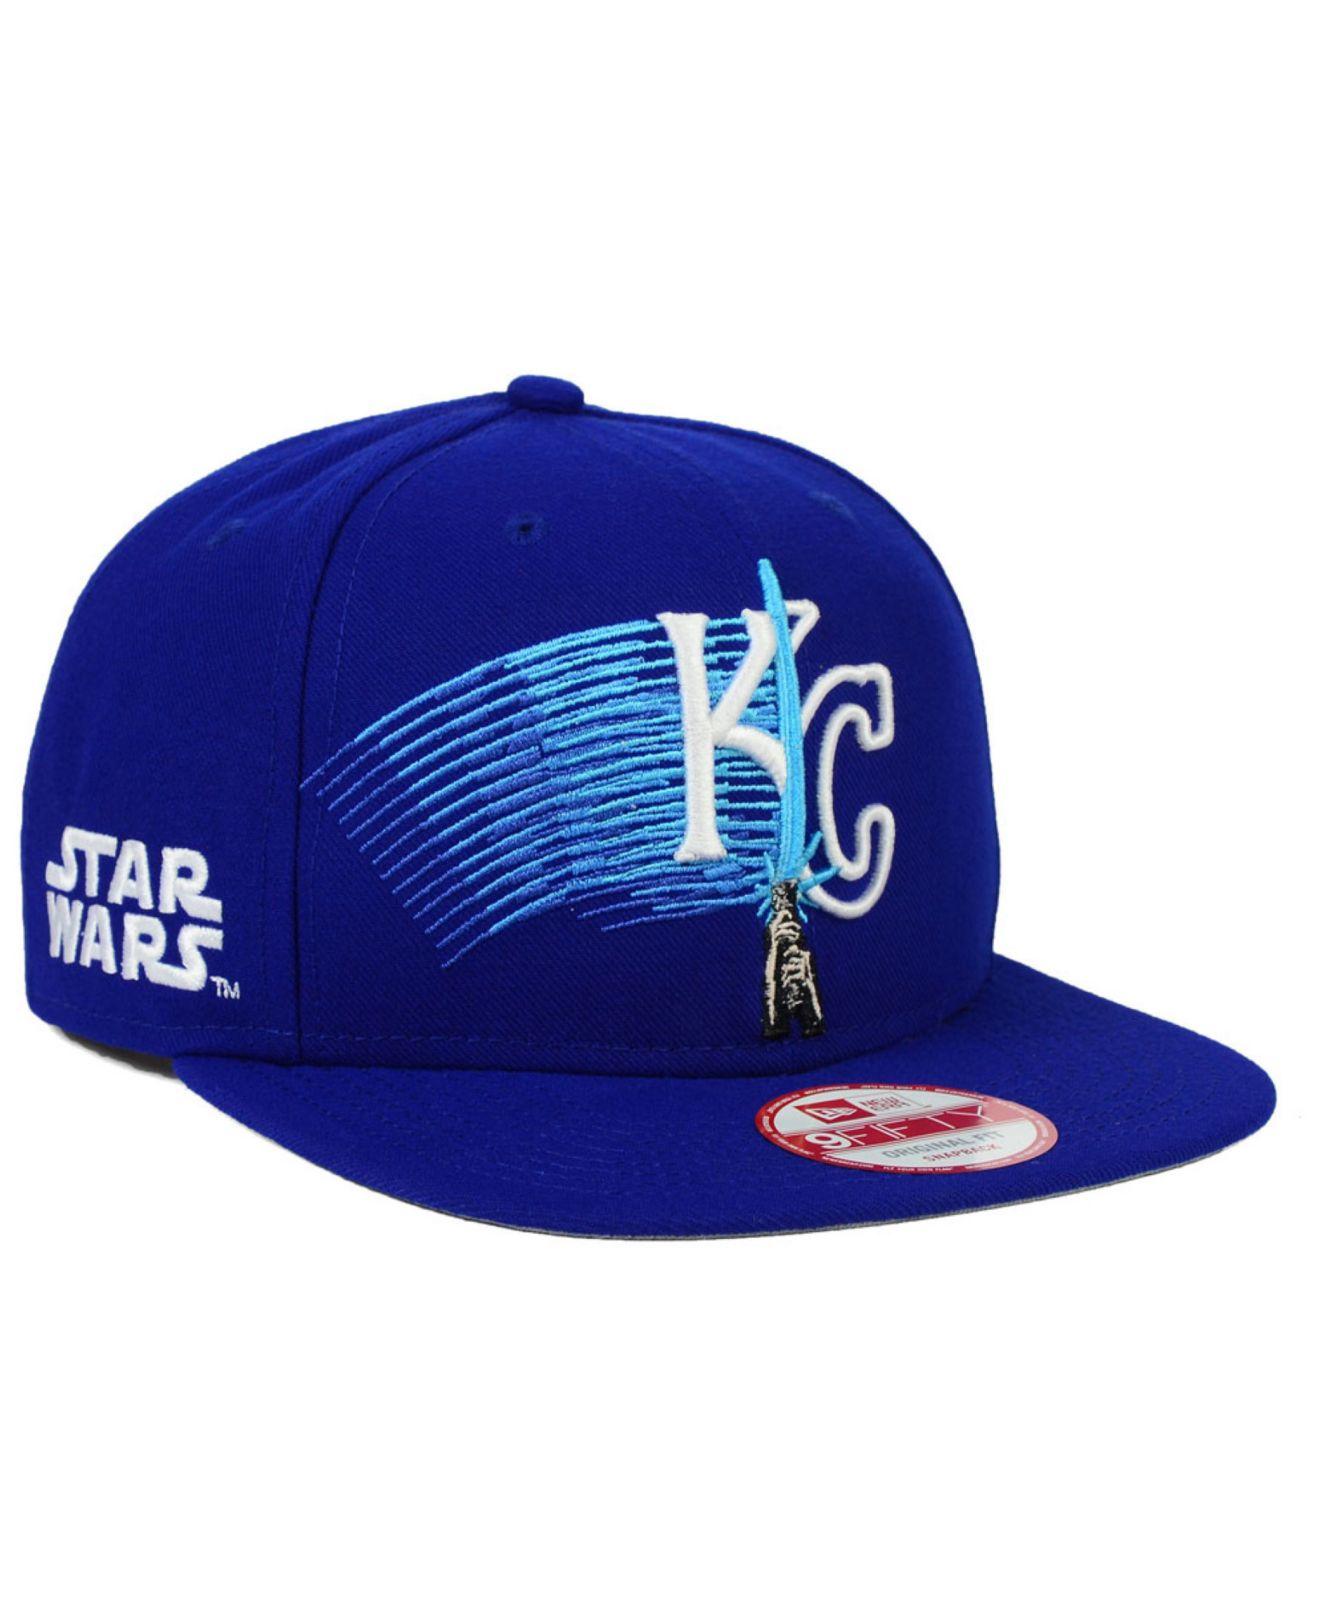 huge discount 27e27 094cc promo code for kansas city royals fedora hat 3b2b1 5dc58